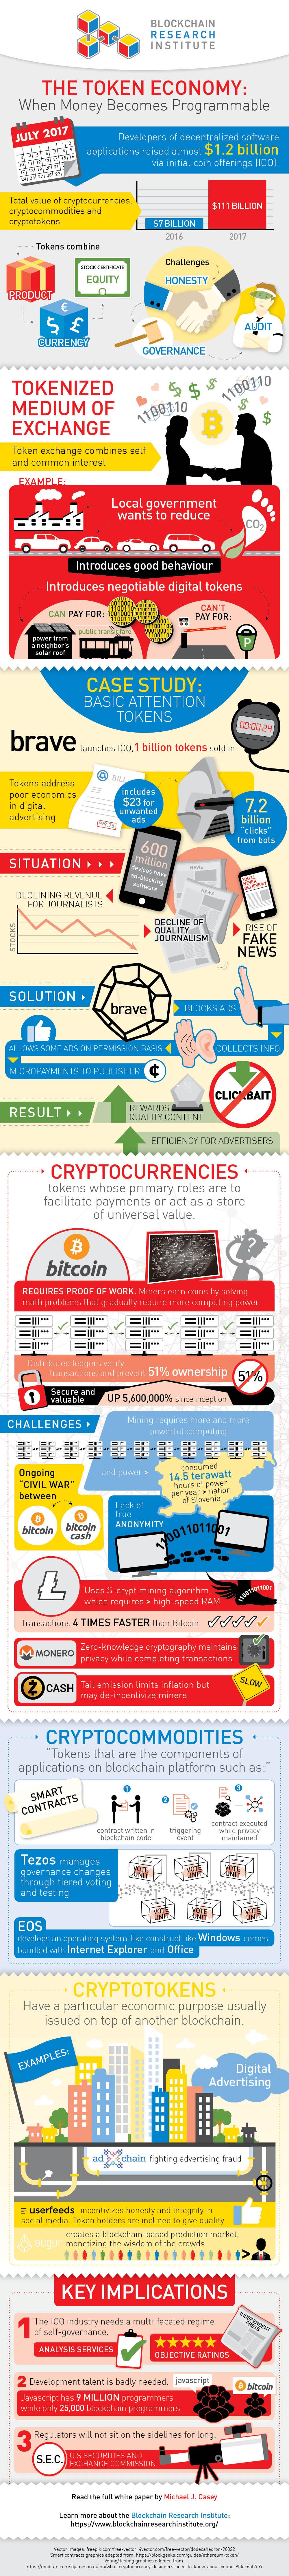 The Token Economy INF.jpg